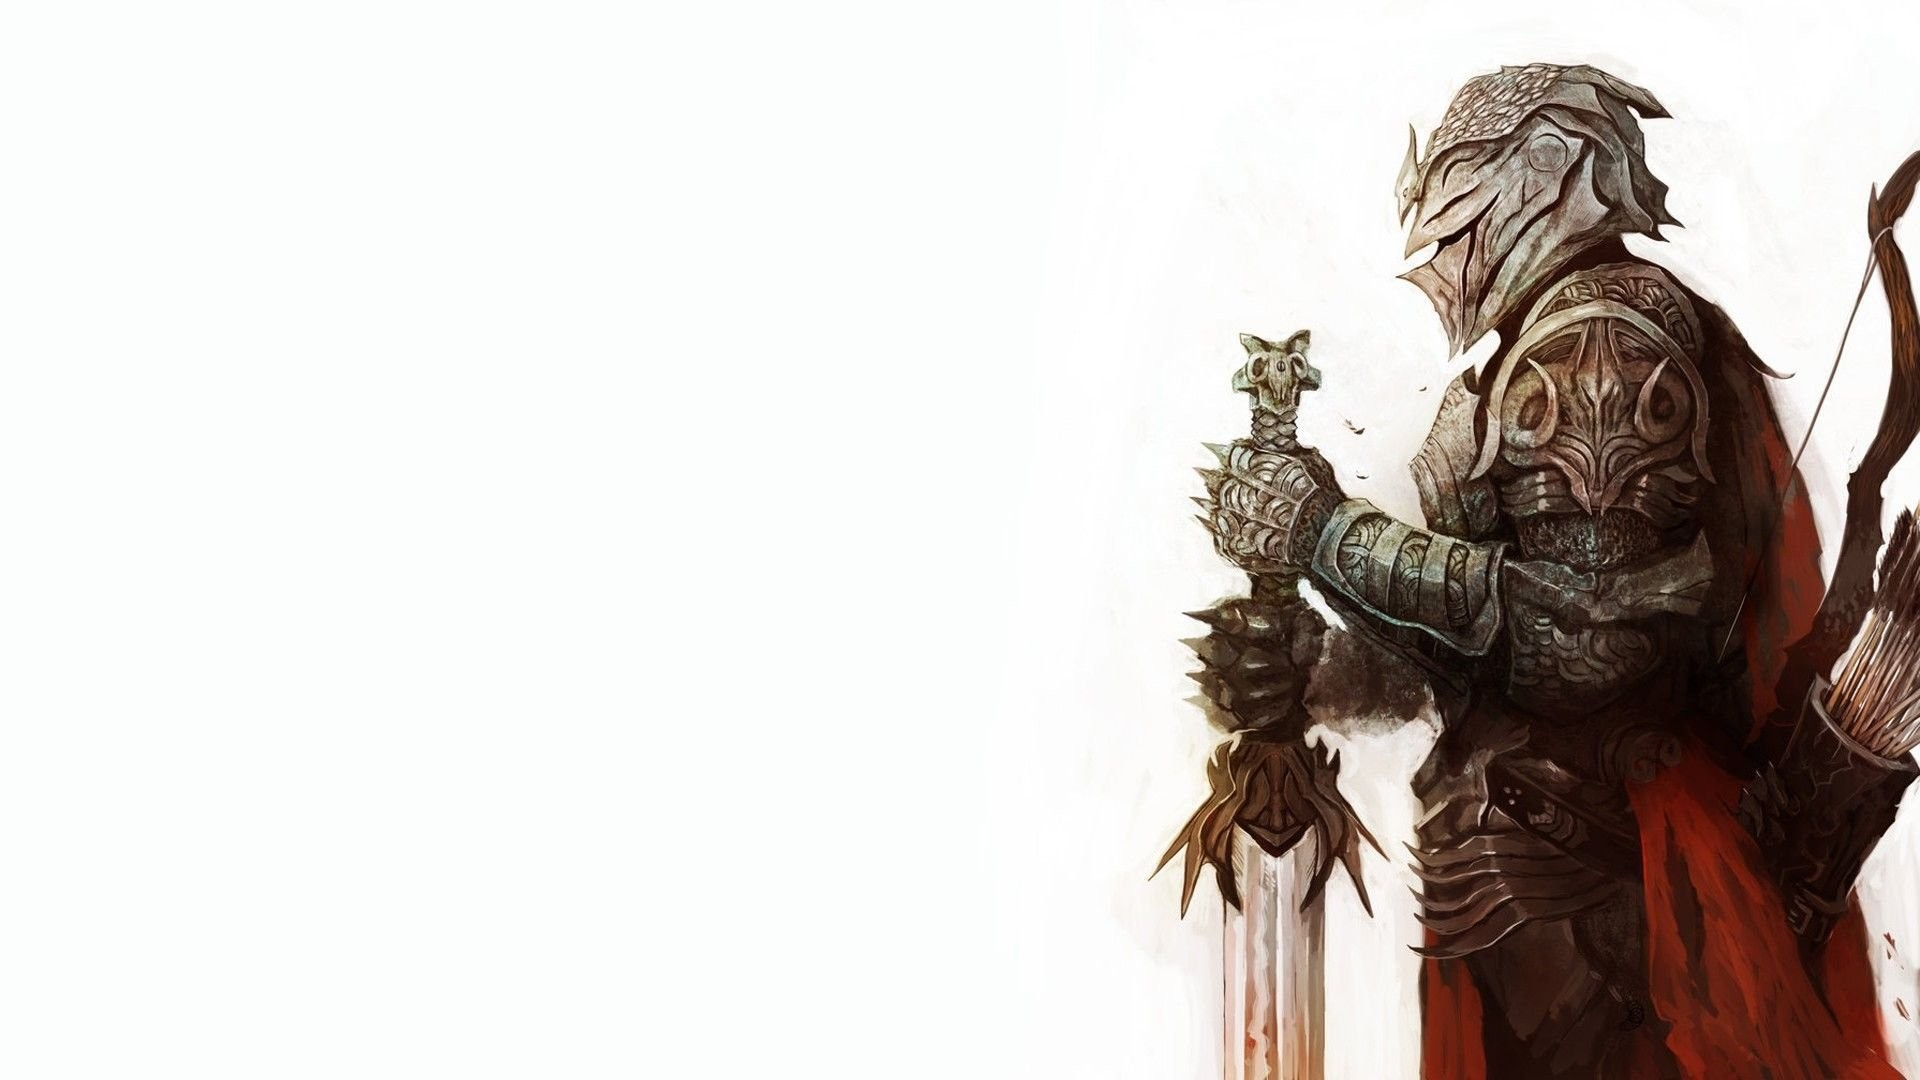 Hd Girl Gun Wallpapers 1080p Knight Sword Wallpaper 76 Images